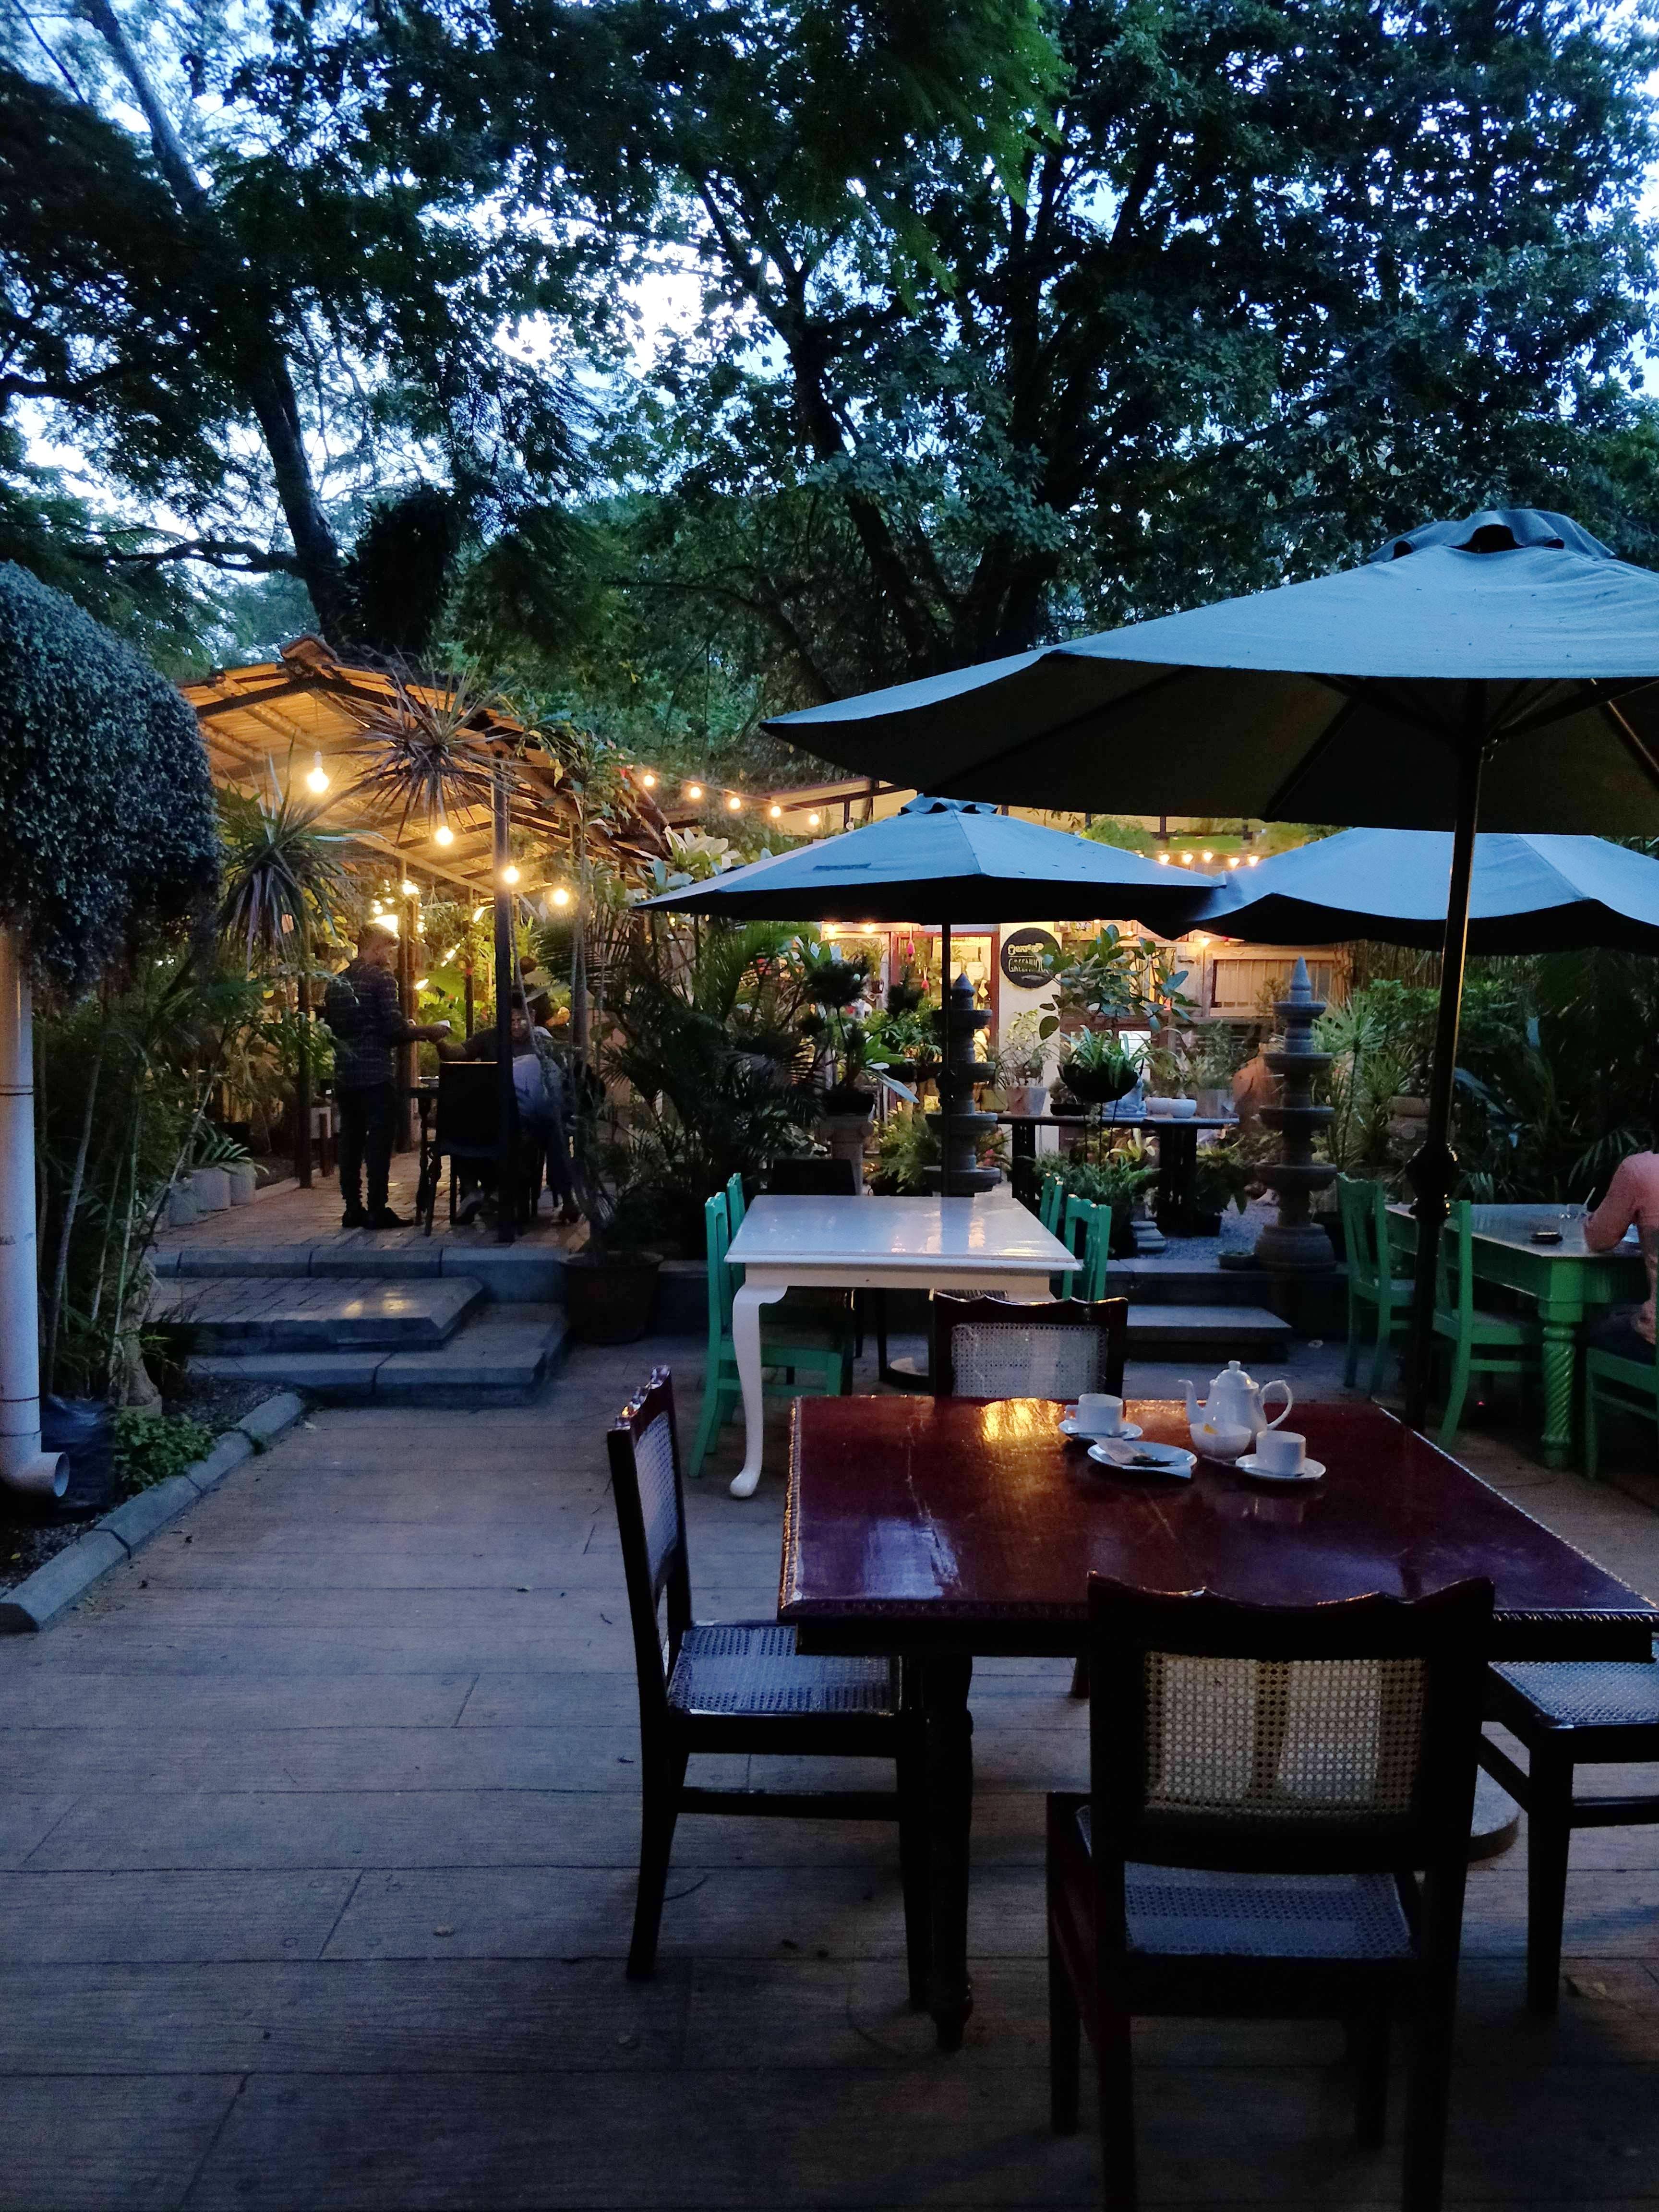 Restaurant,Sky,Lighting,Night,Tree,Evening,Table,Atmosphere,Patio,Building